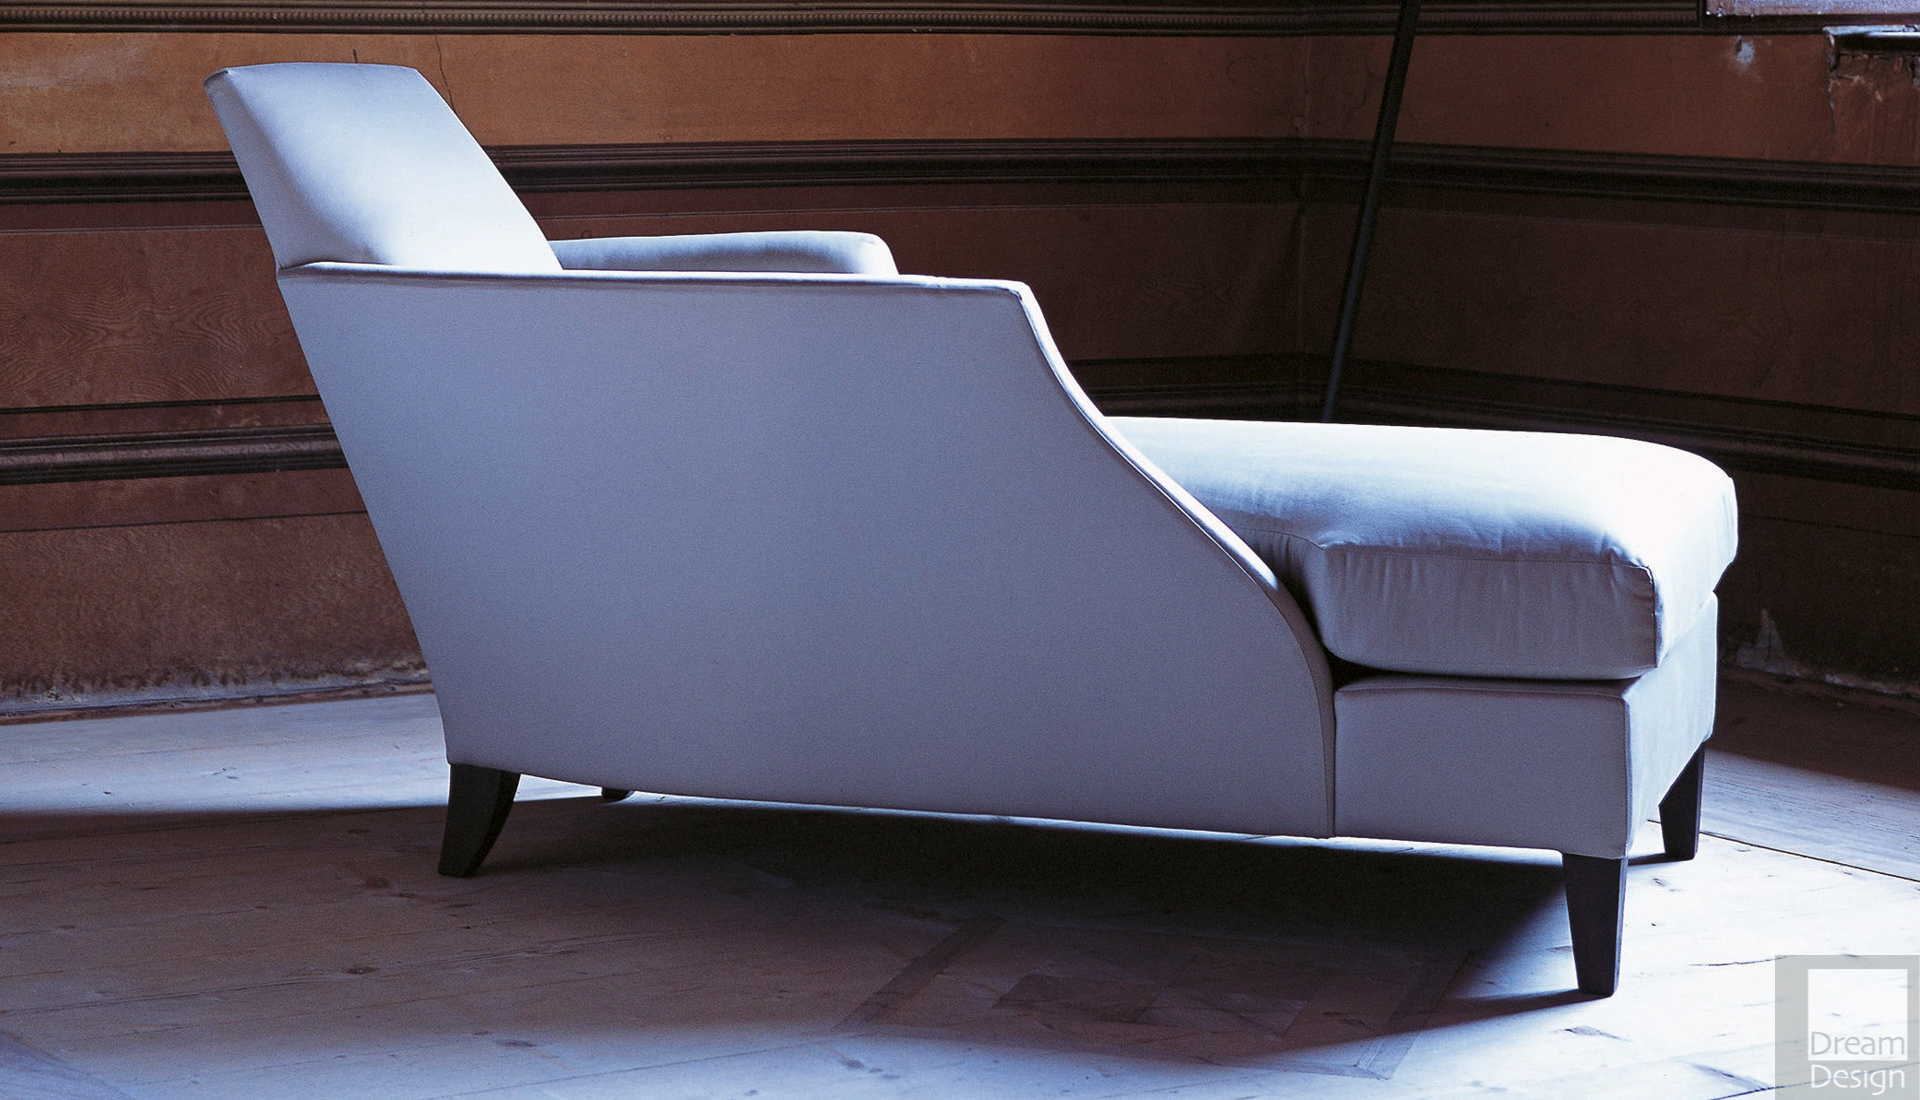 Flexform Mood Relax Chaise Longue Dream Design Interiors Ltd